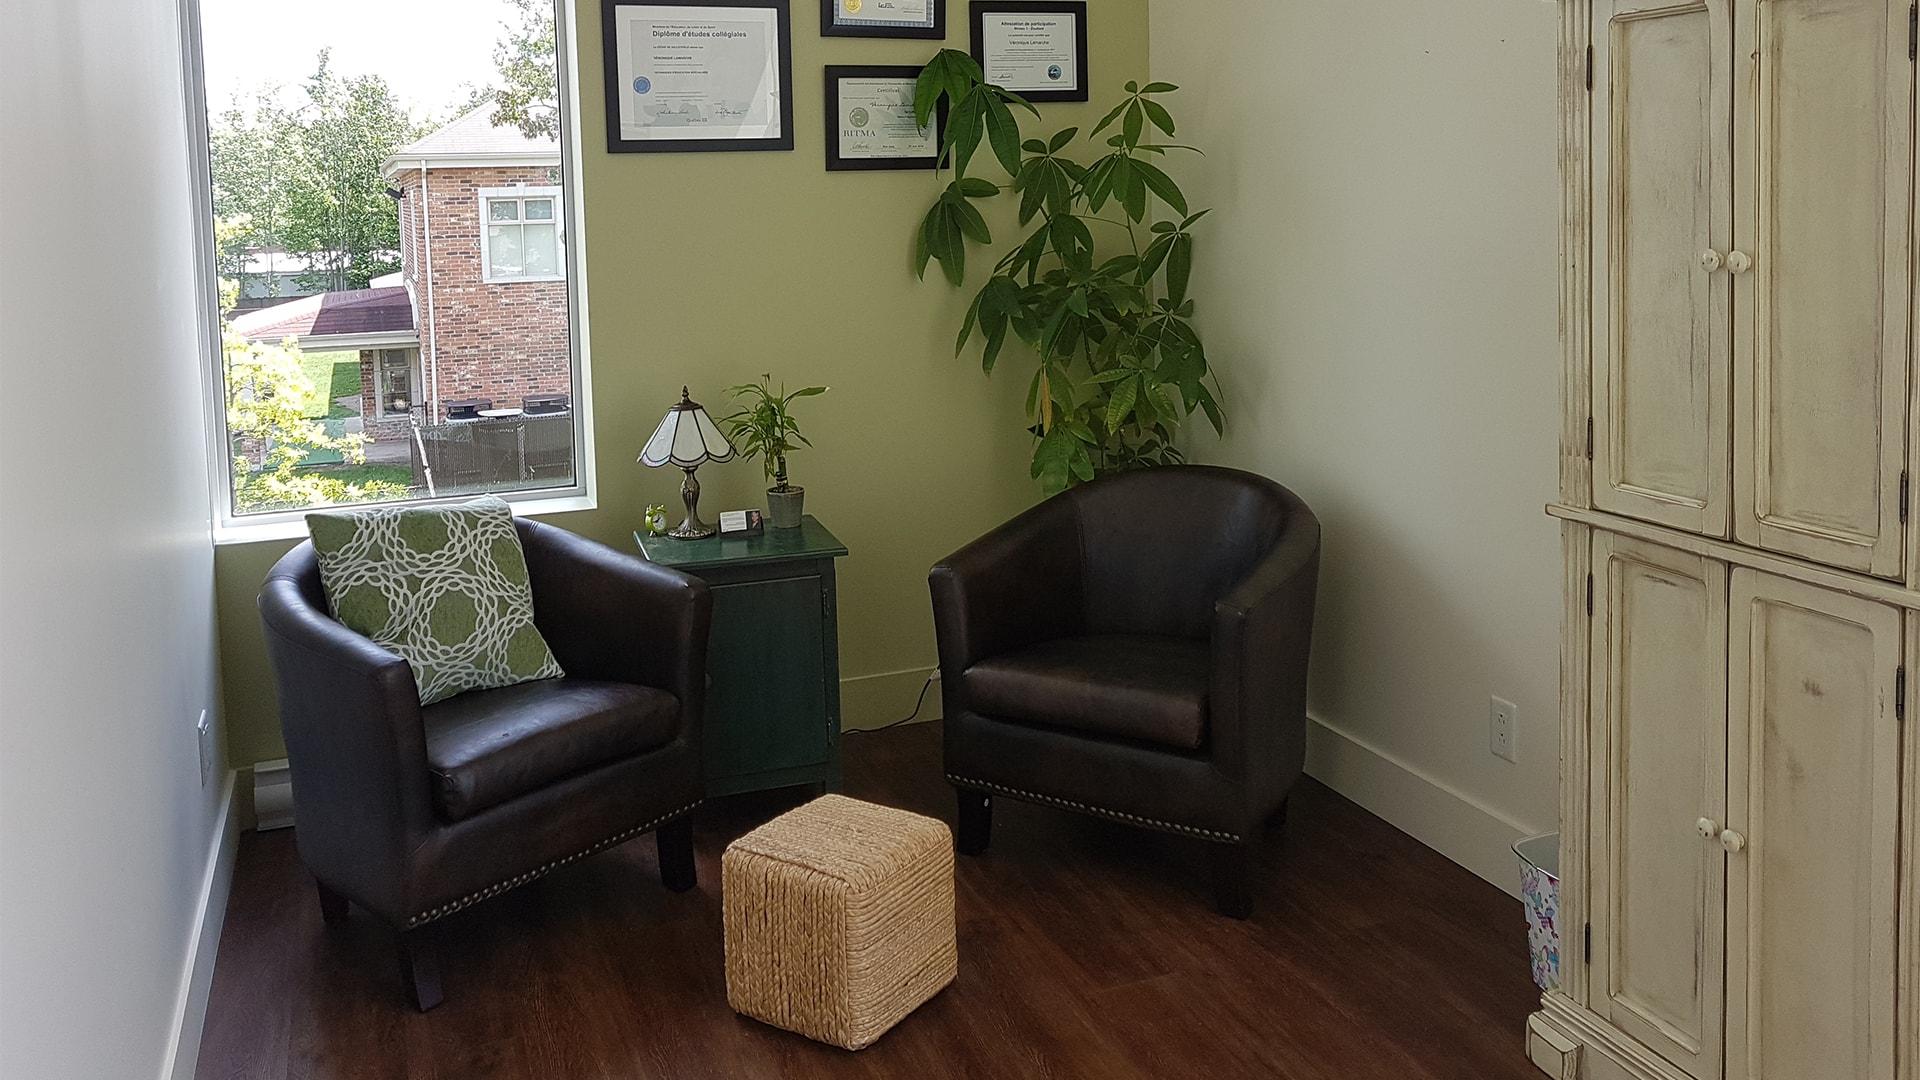 location de salle de consultation 1